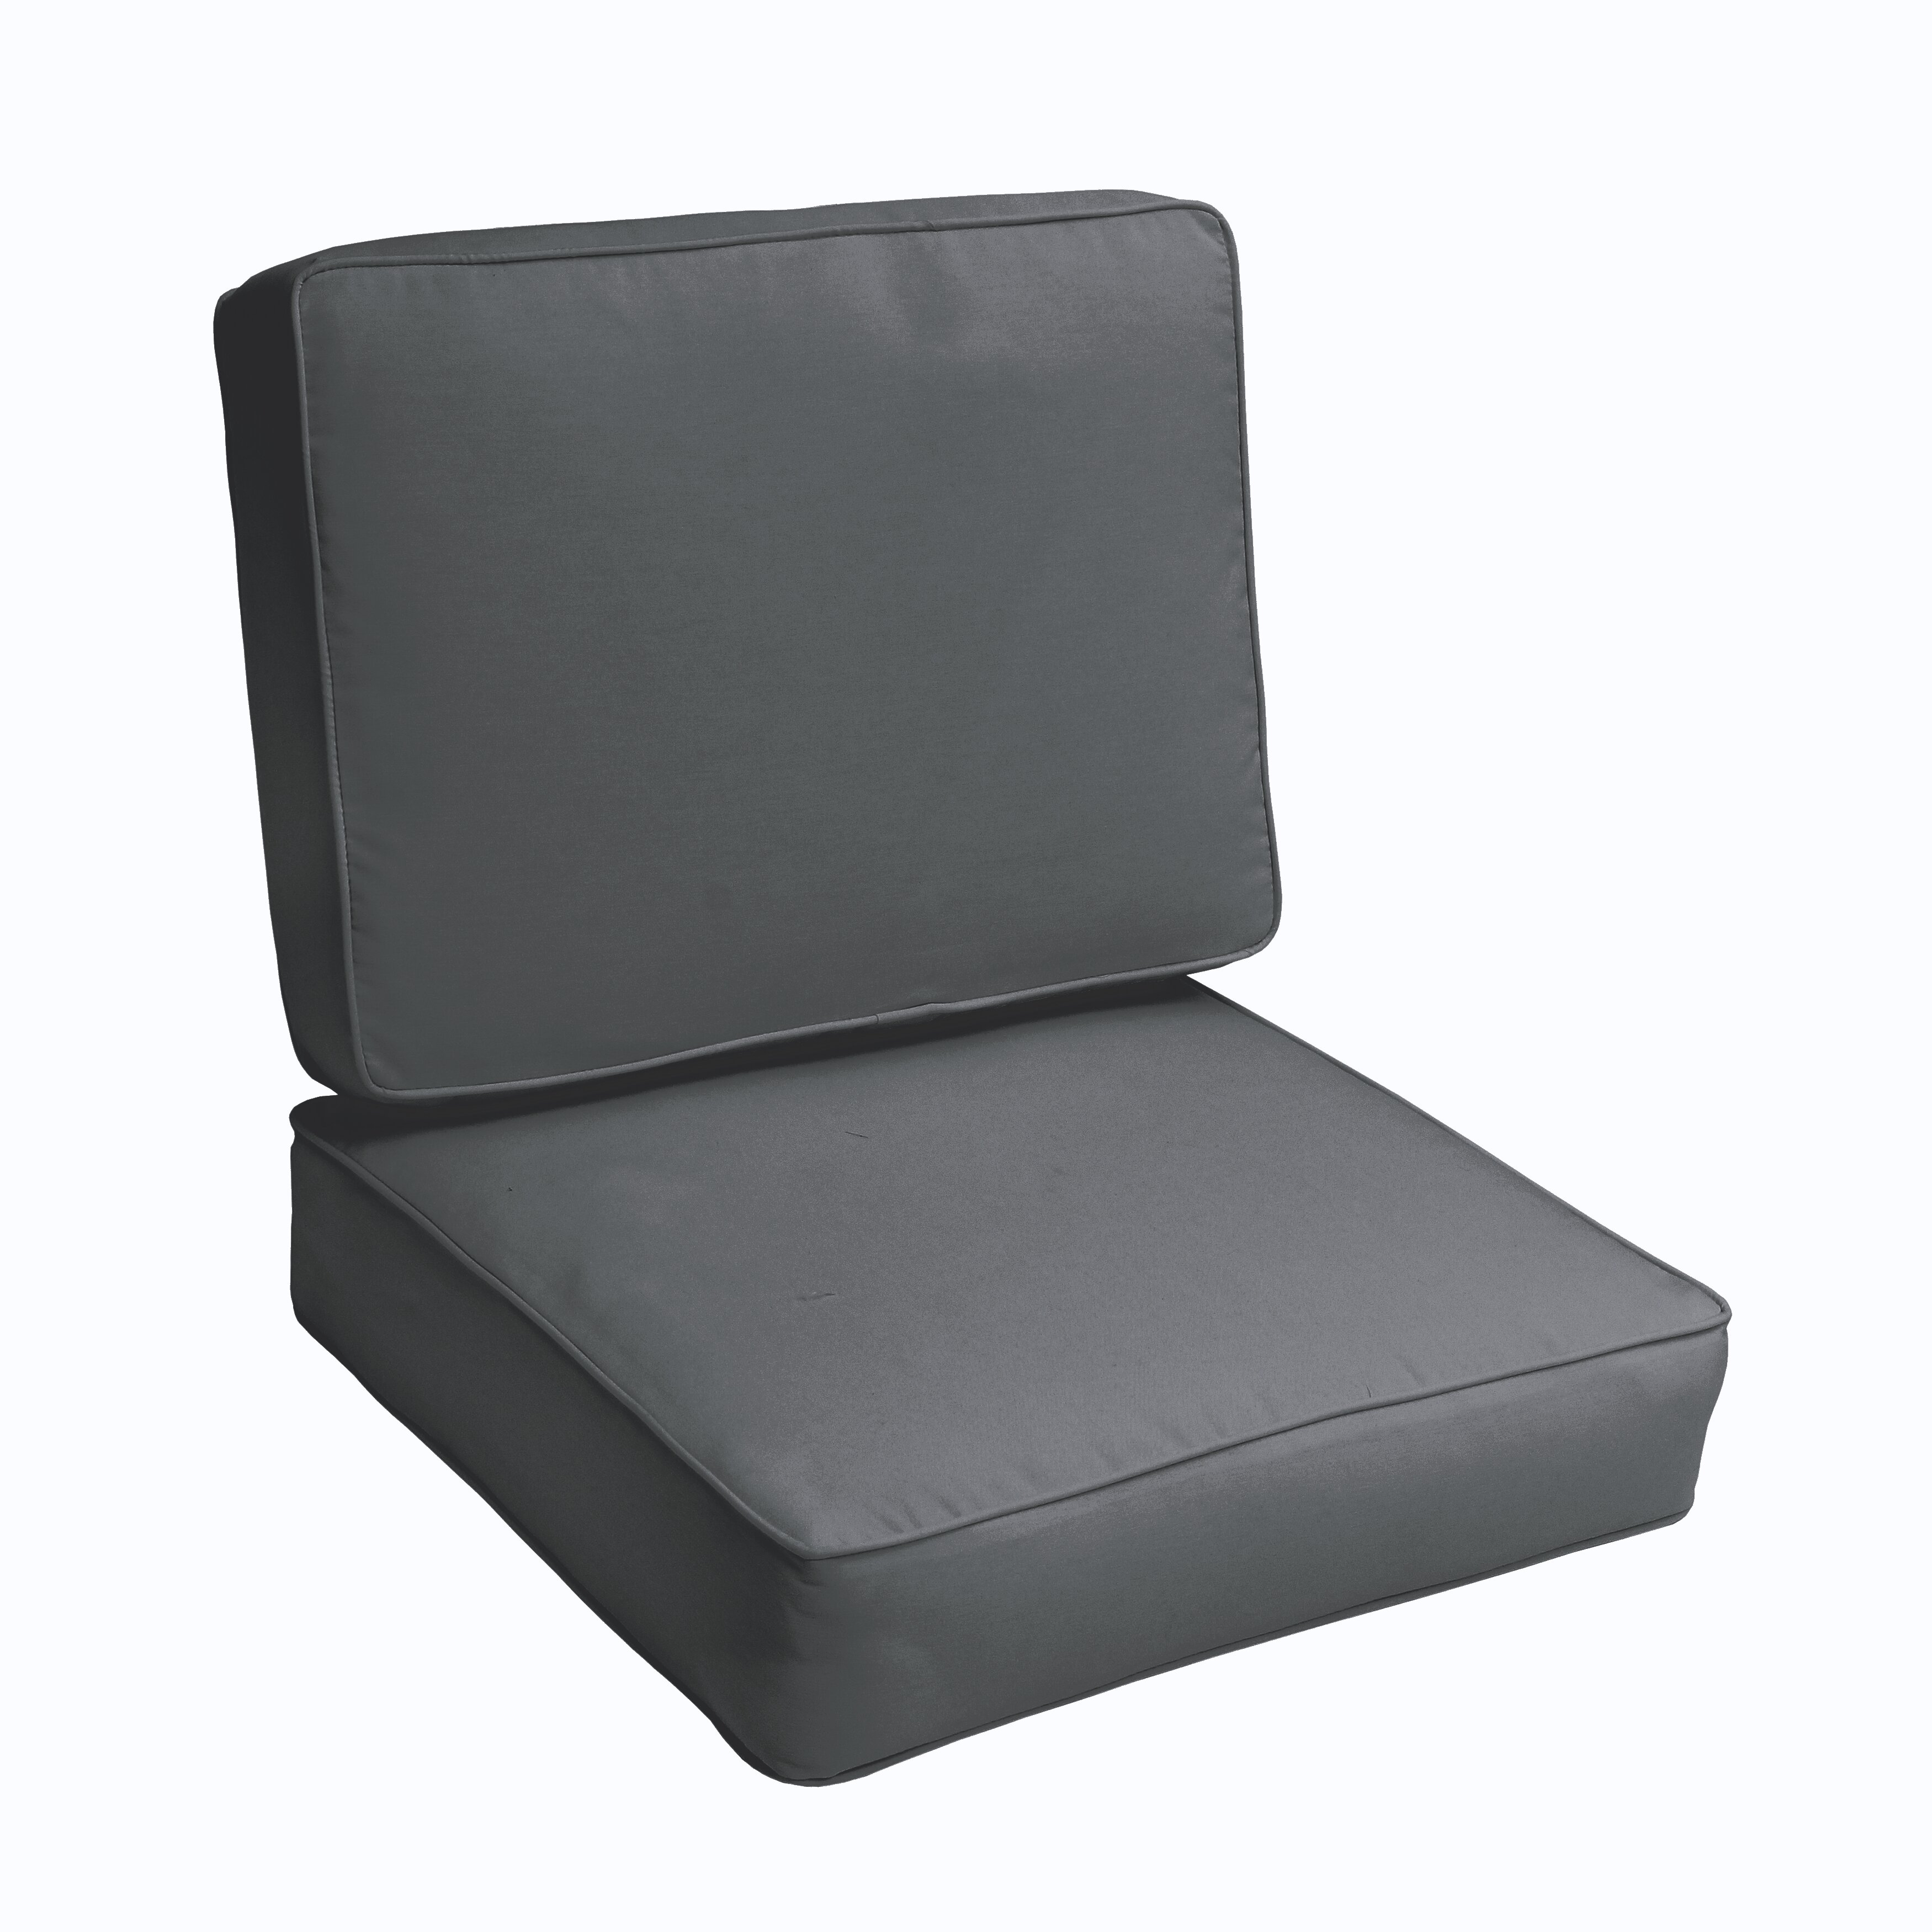 Bay Isle Home Outdoor Lounge Chair Cushion & Reviews